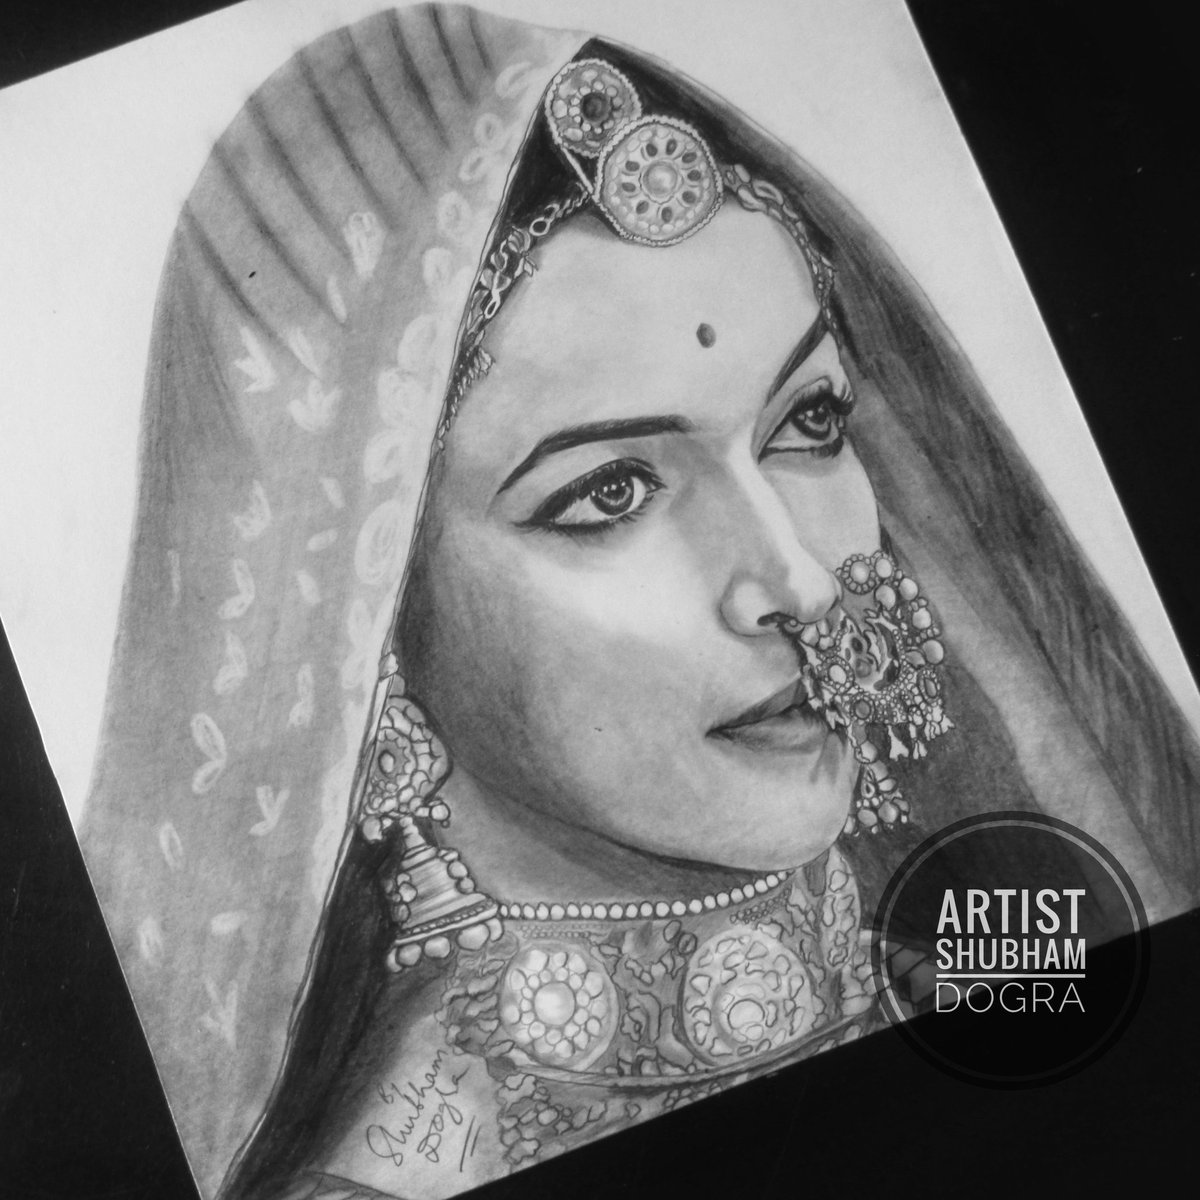 Artist shubham dogra on twitter pencil sketch of deepika padukone